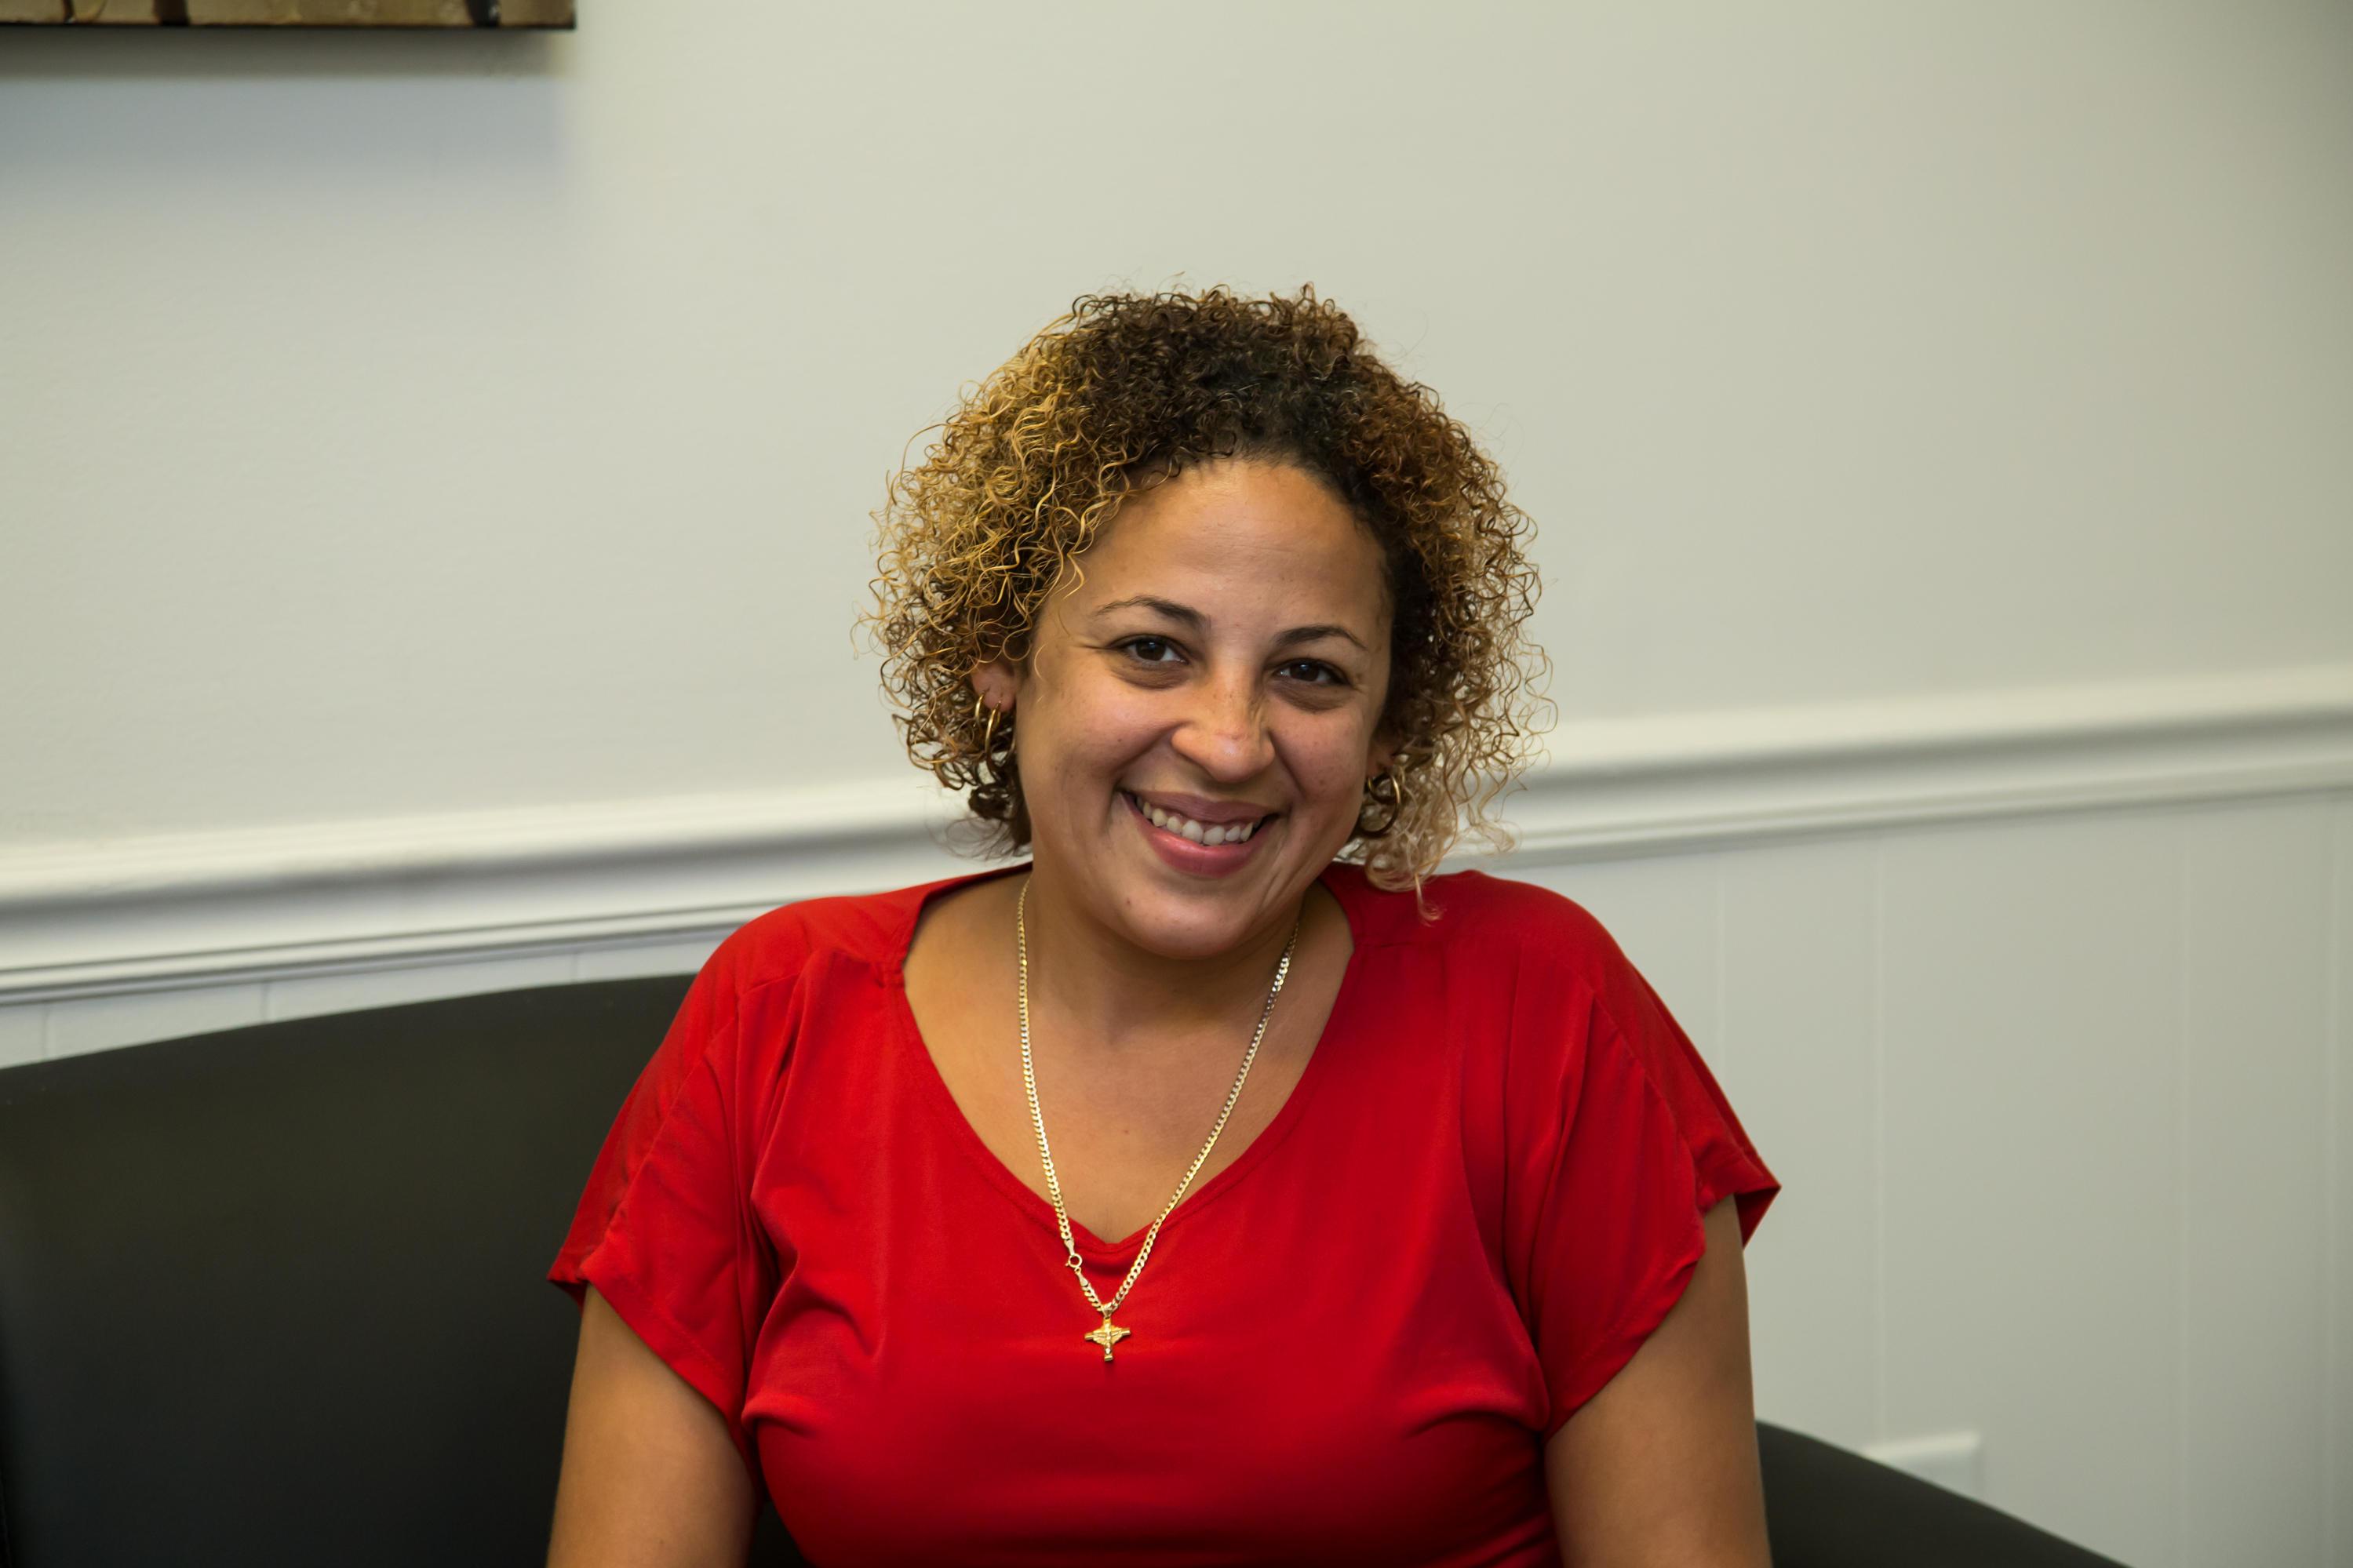 Our wonderful Legal Assistant Melissa